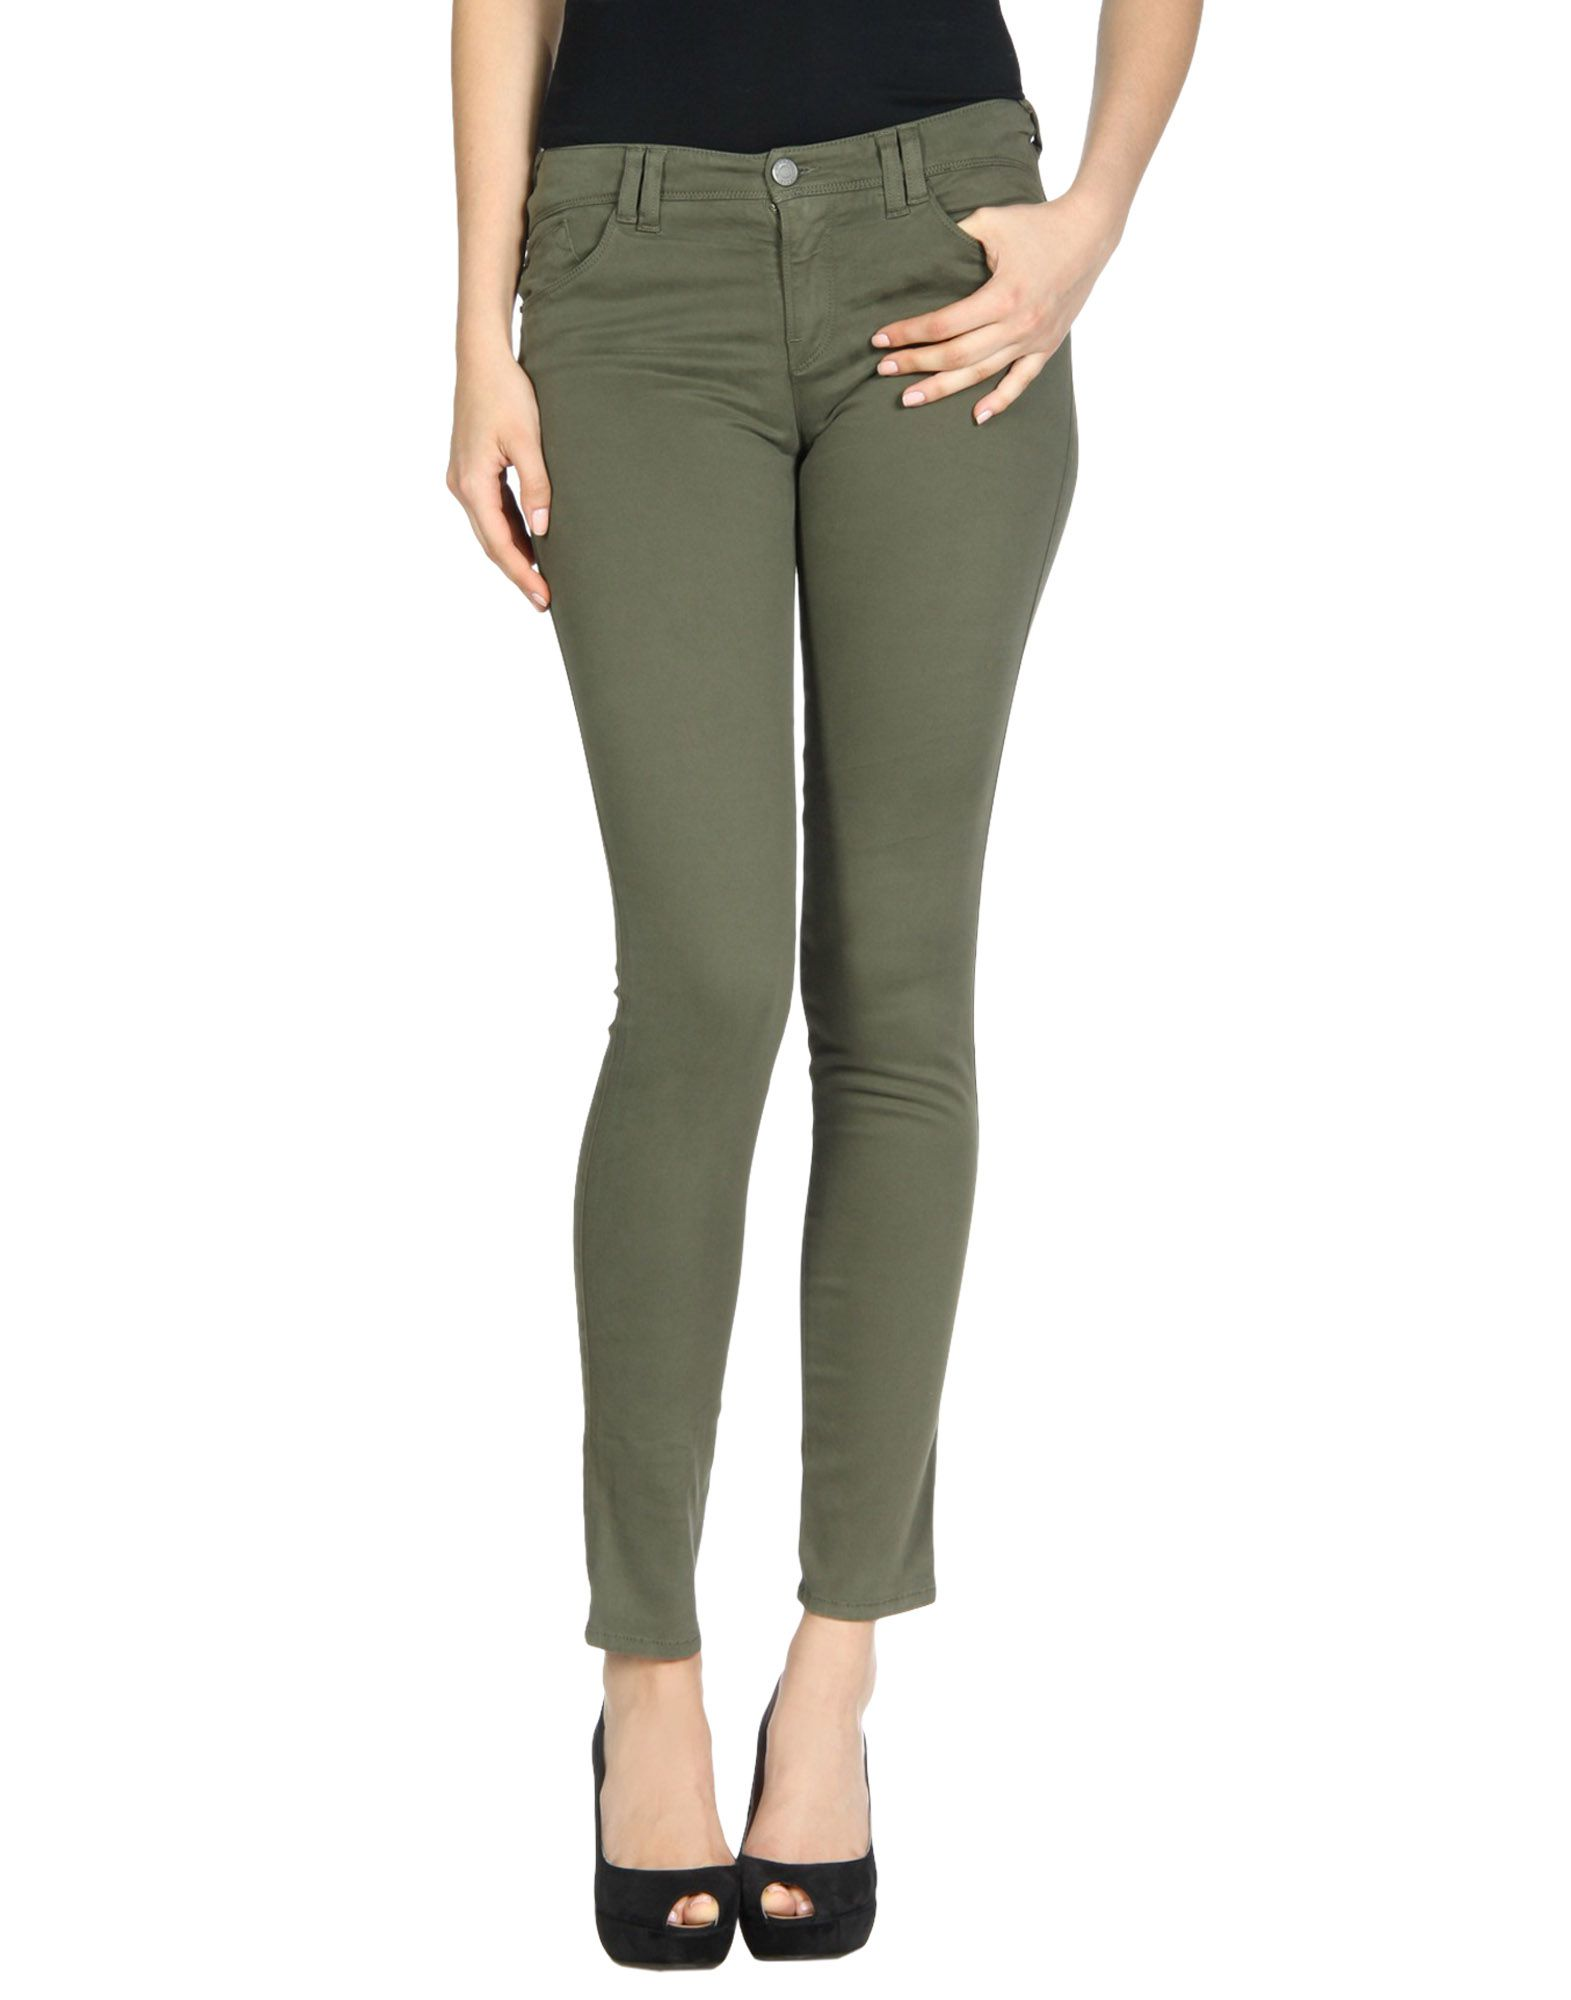 Pantalone Armani Armani Armani Jeans donna - 13080031VJ e7b